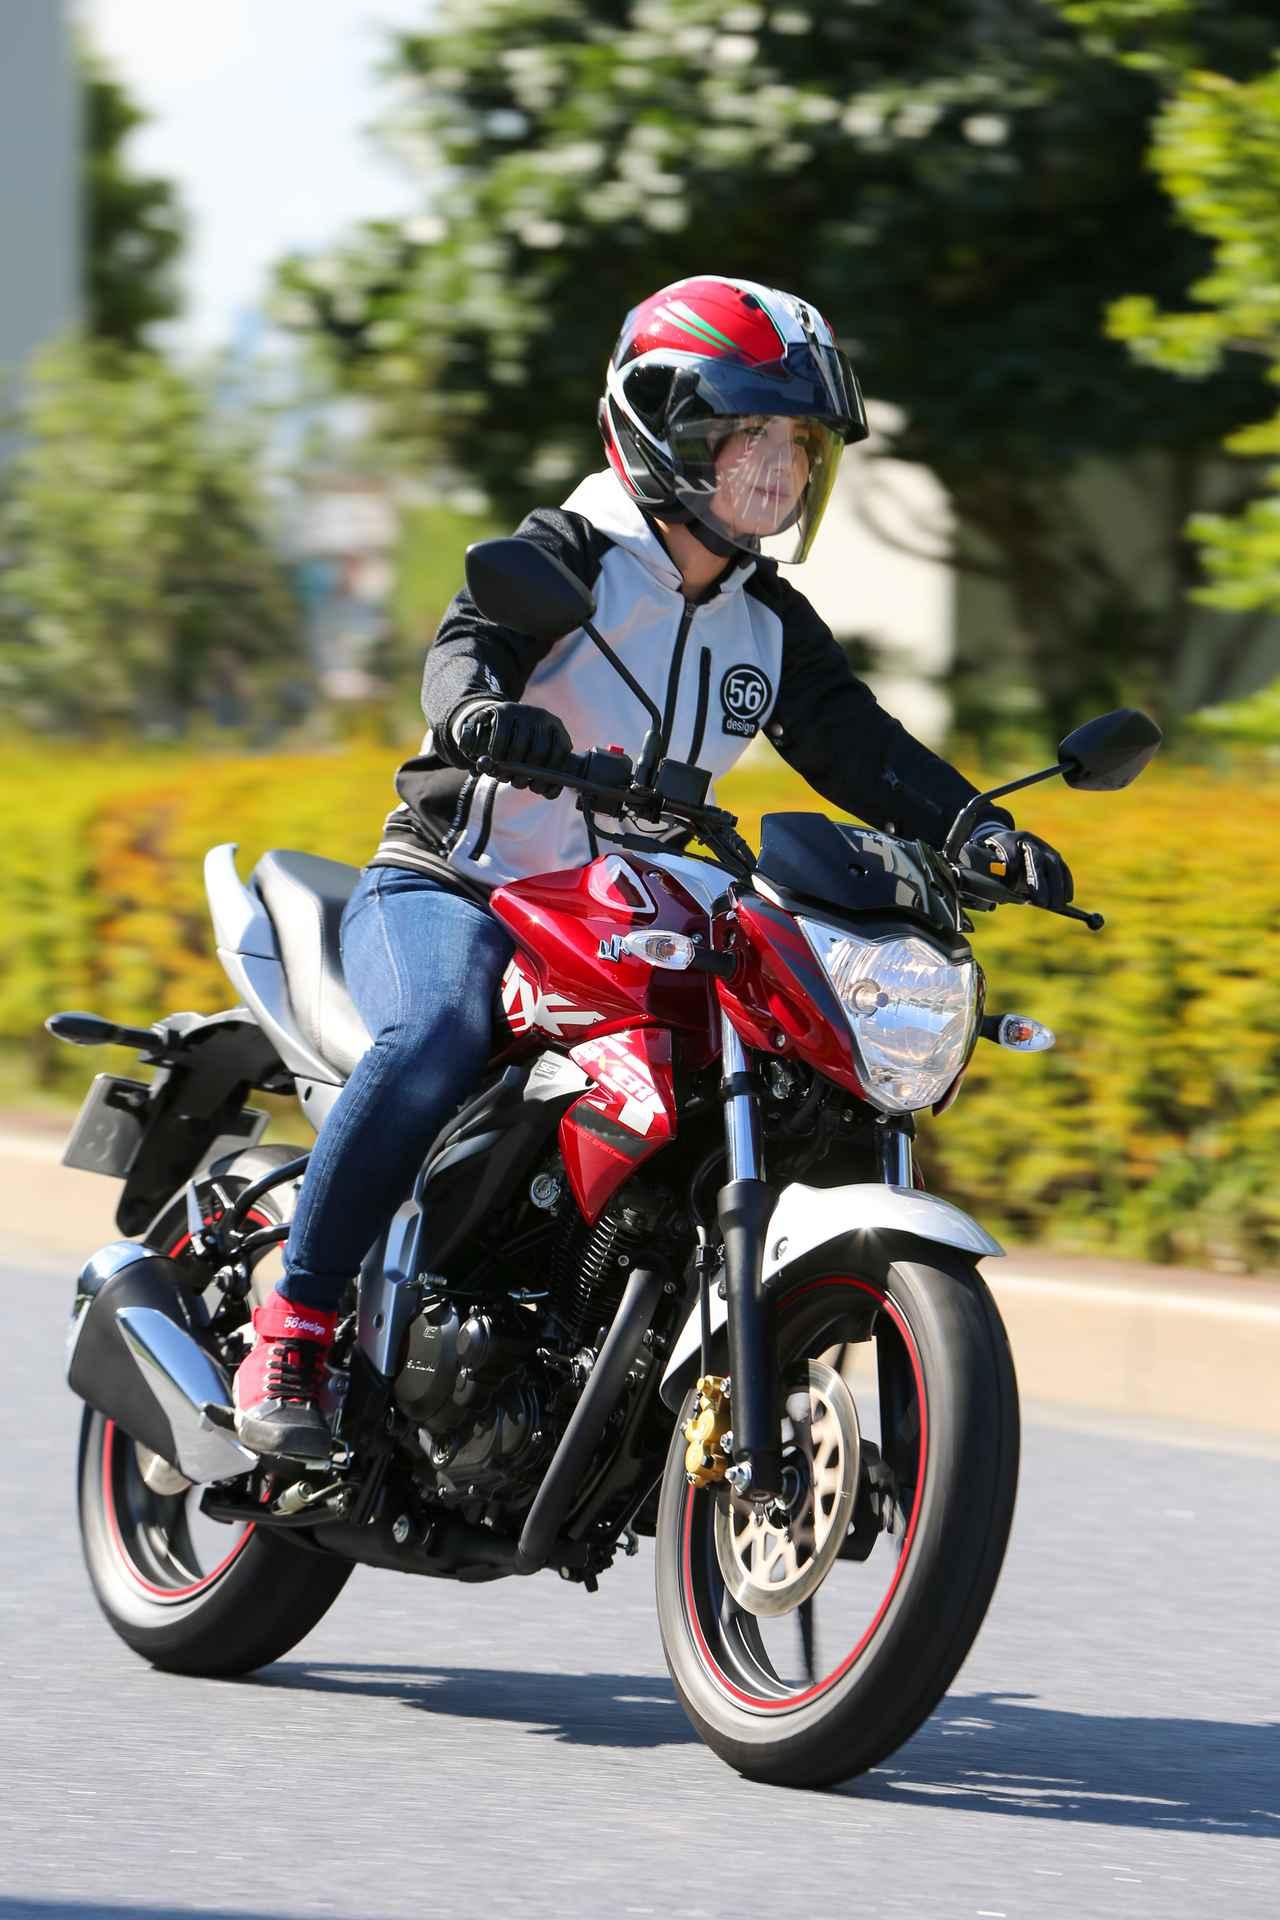 Images : 11番目の画像 - ほぼ月刊「梅本まどかとオートバイ」vol.20 SUZUKI GIXXER - webオートバイ